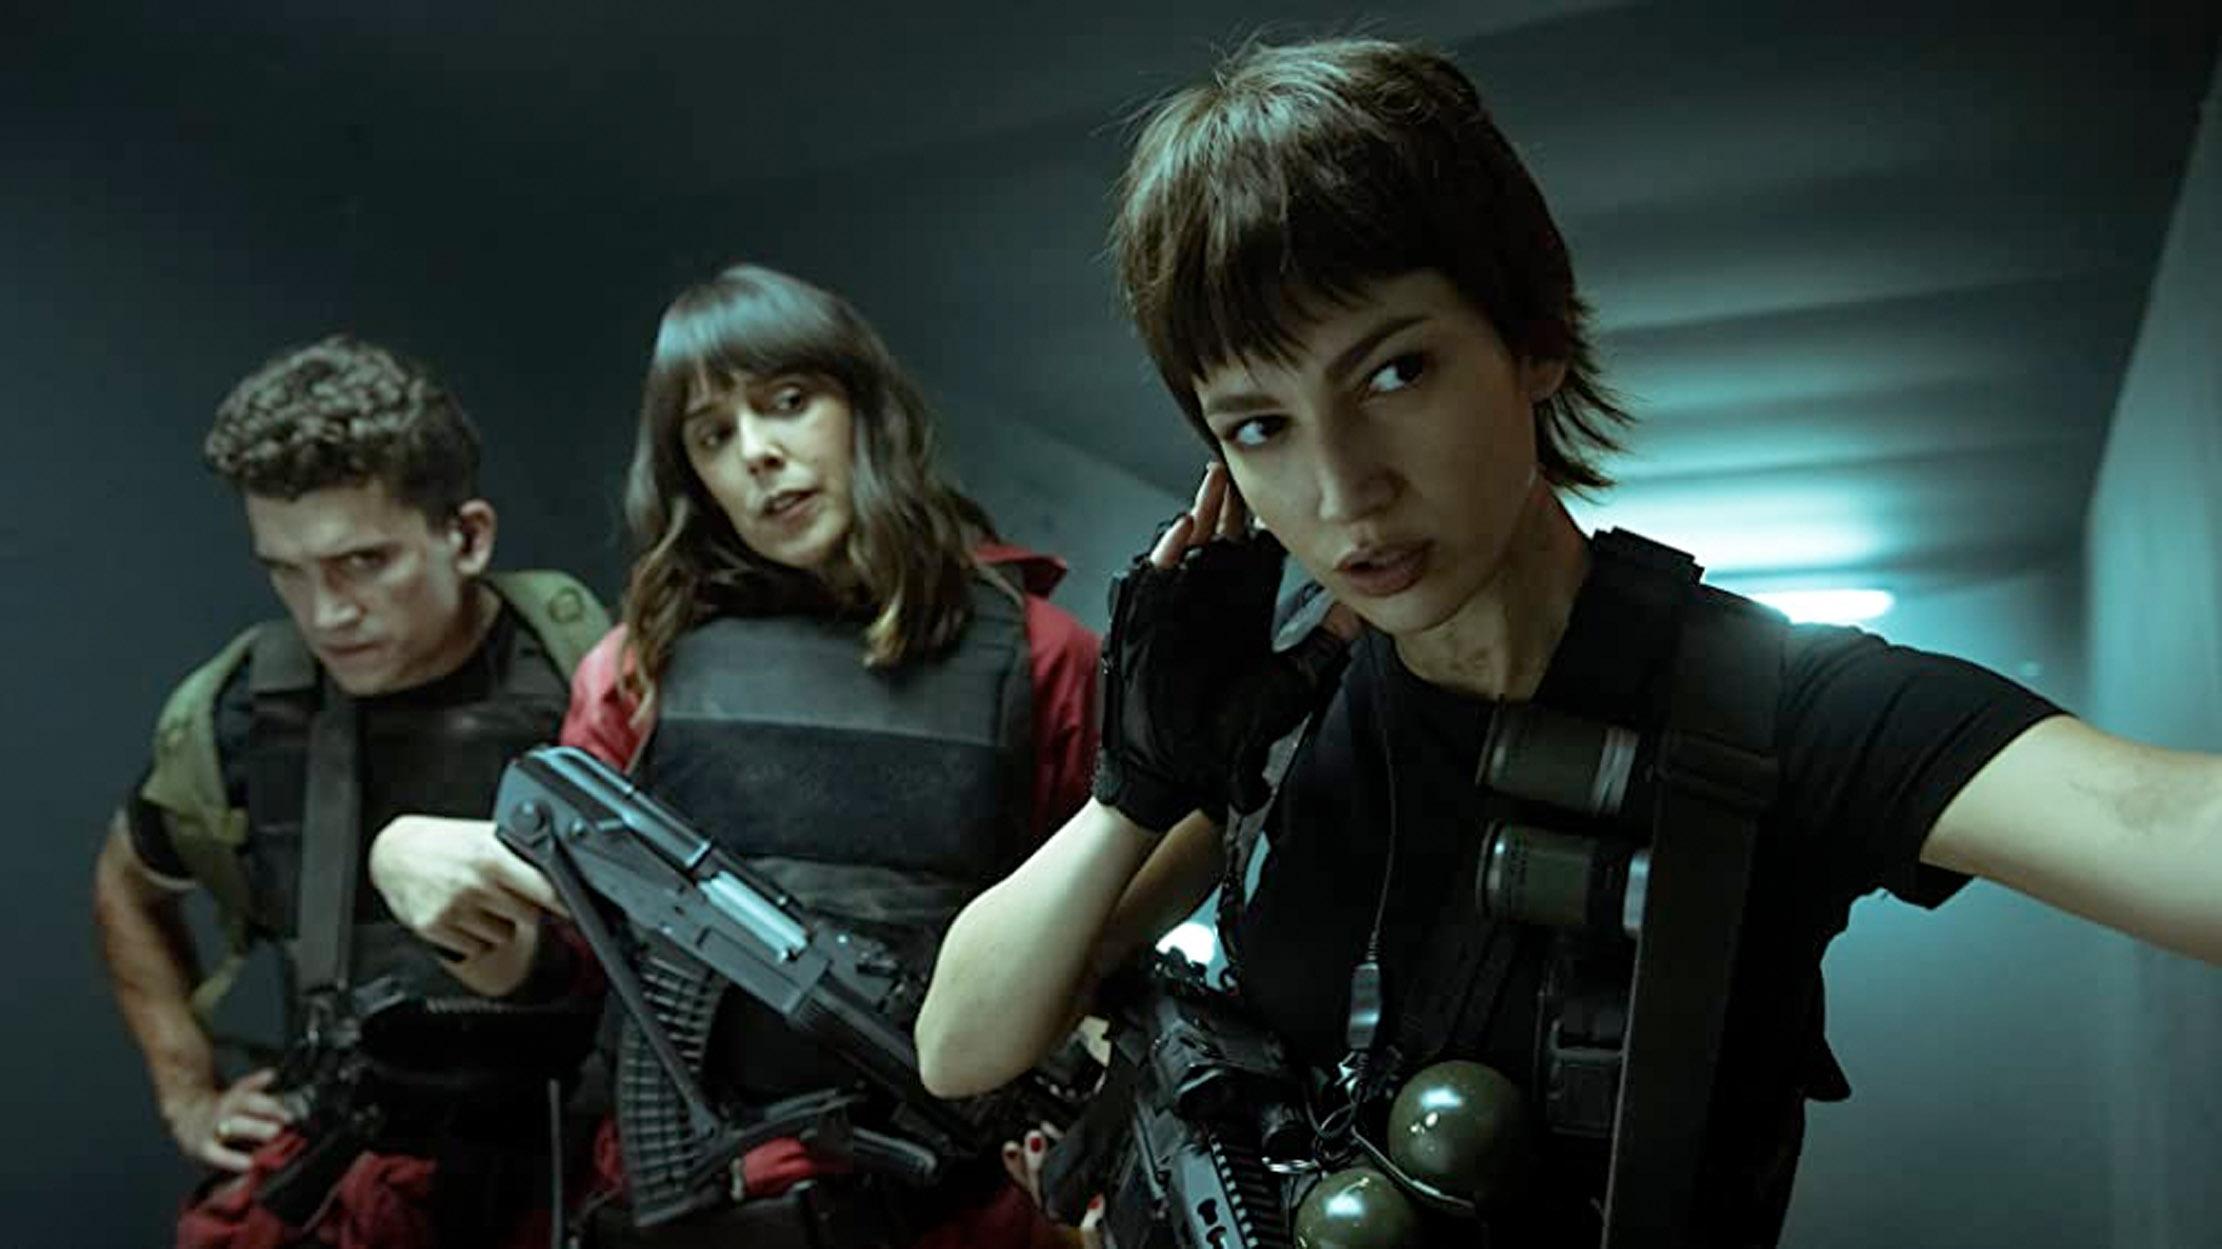 Úrsula Corberó, Belén Cuesta, Jaime Lorente (Netflix)